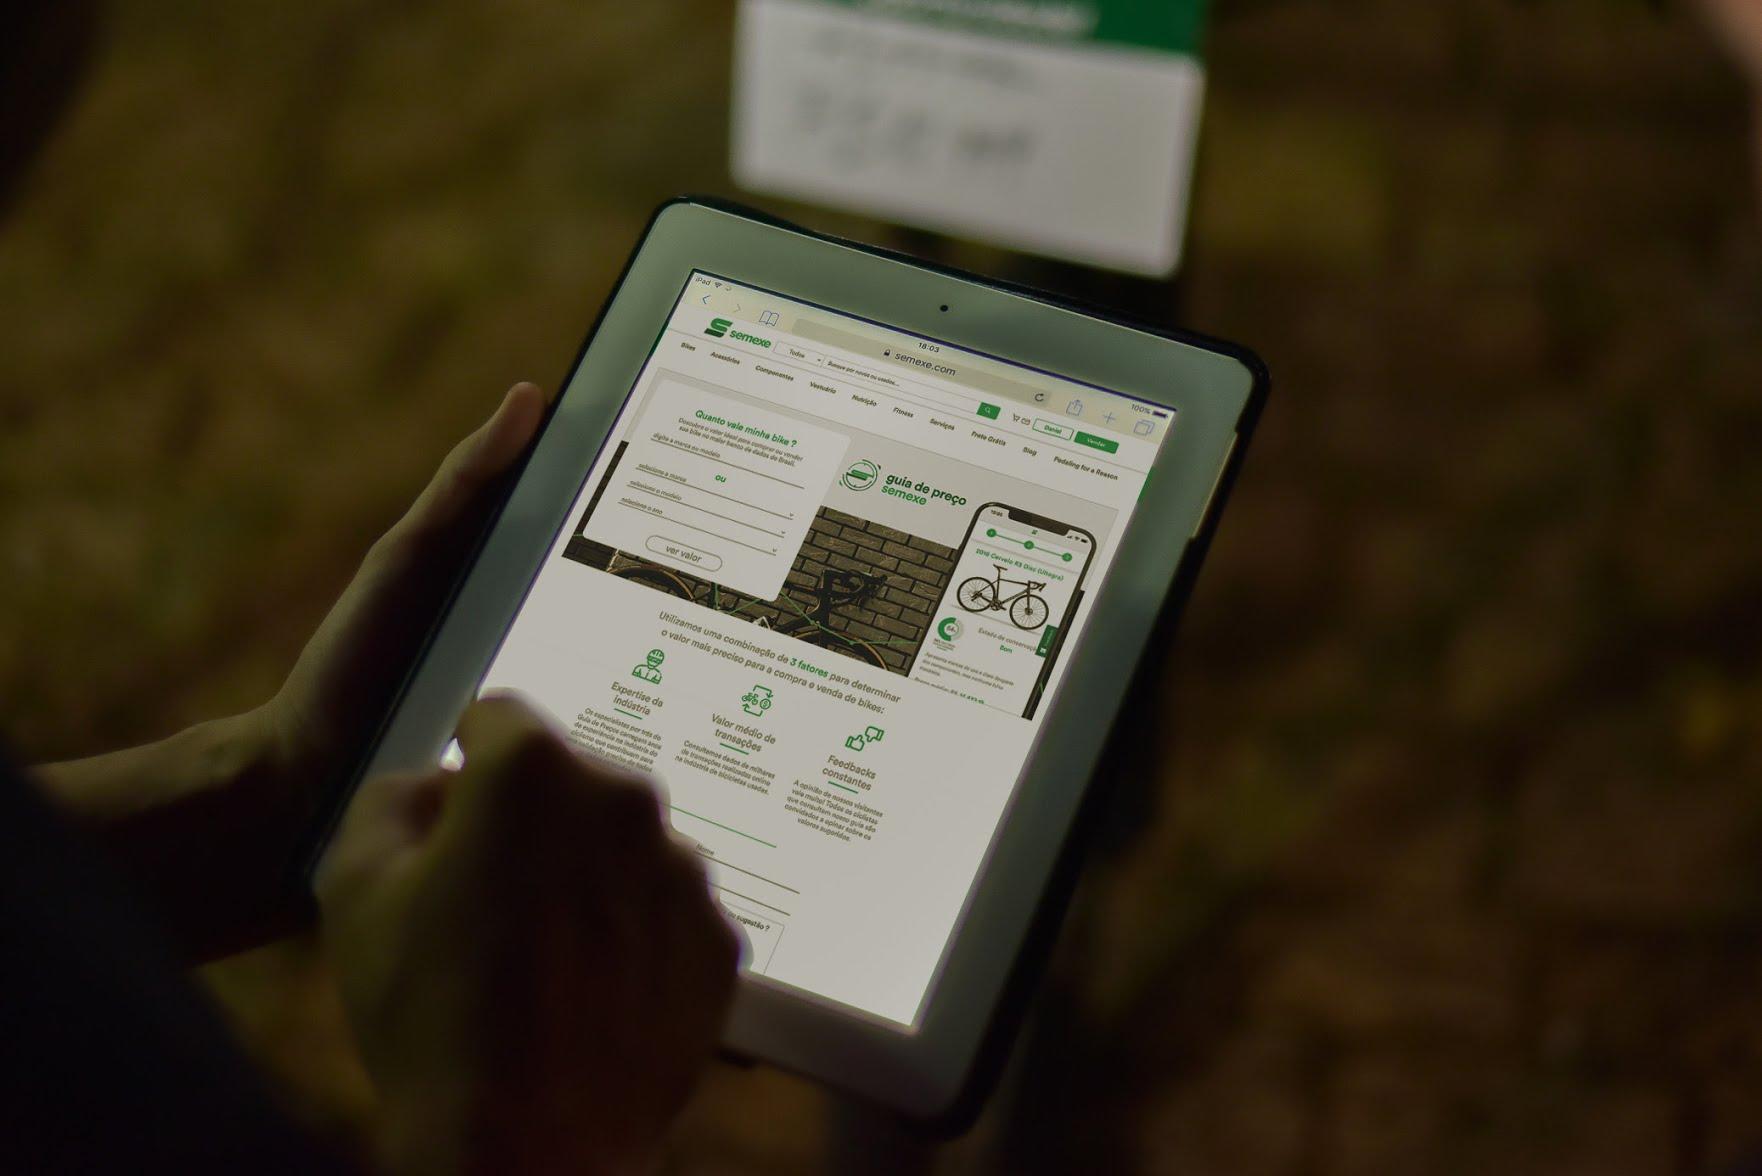 tablet com a pagina da tabela fipe de bicicletas ou guia de precos da semexe aberta